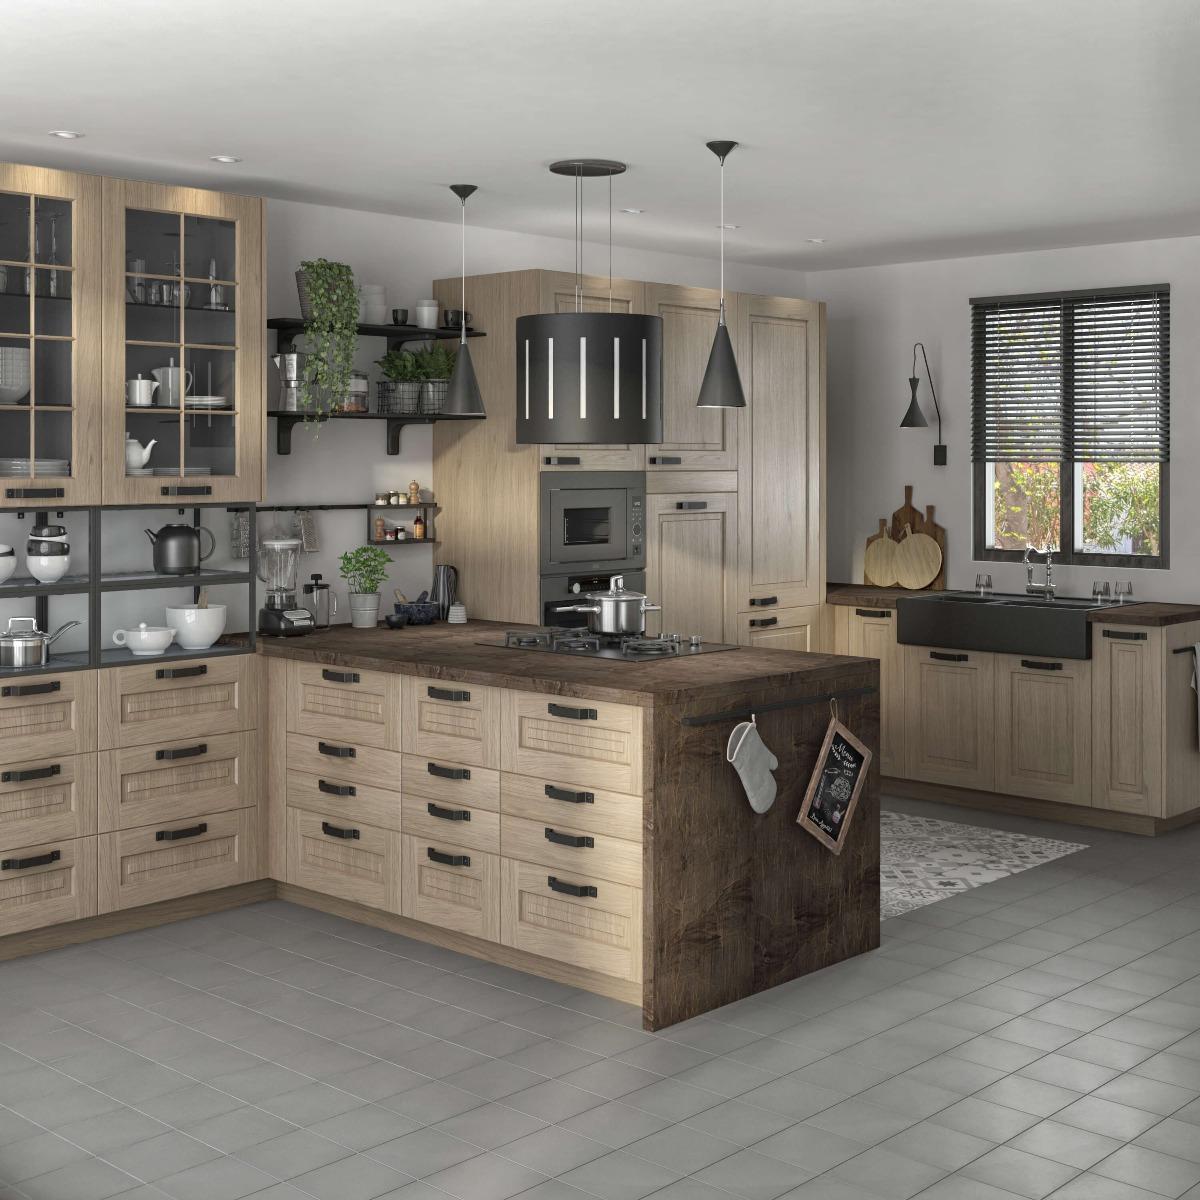 Delinia Prague Designer Kitchen - Example 2